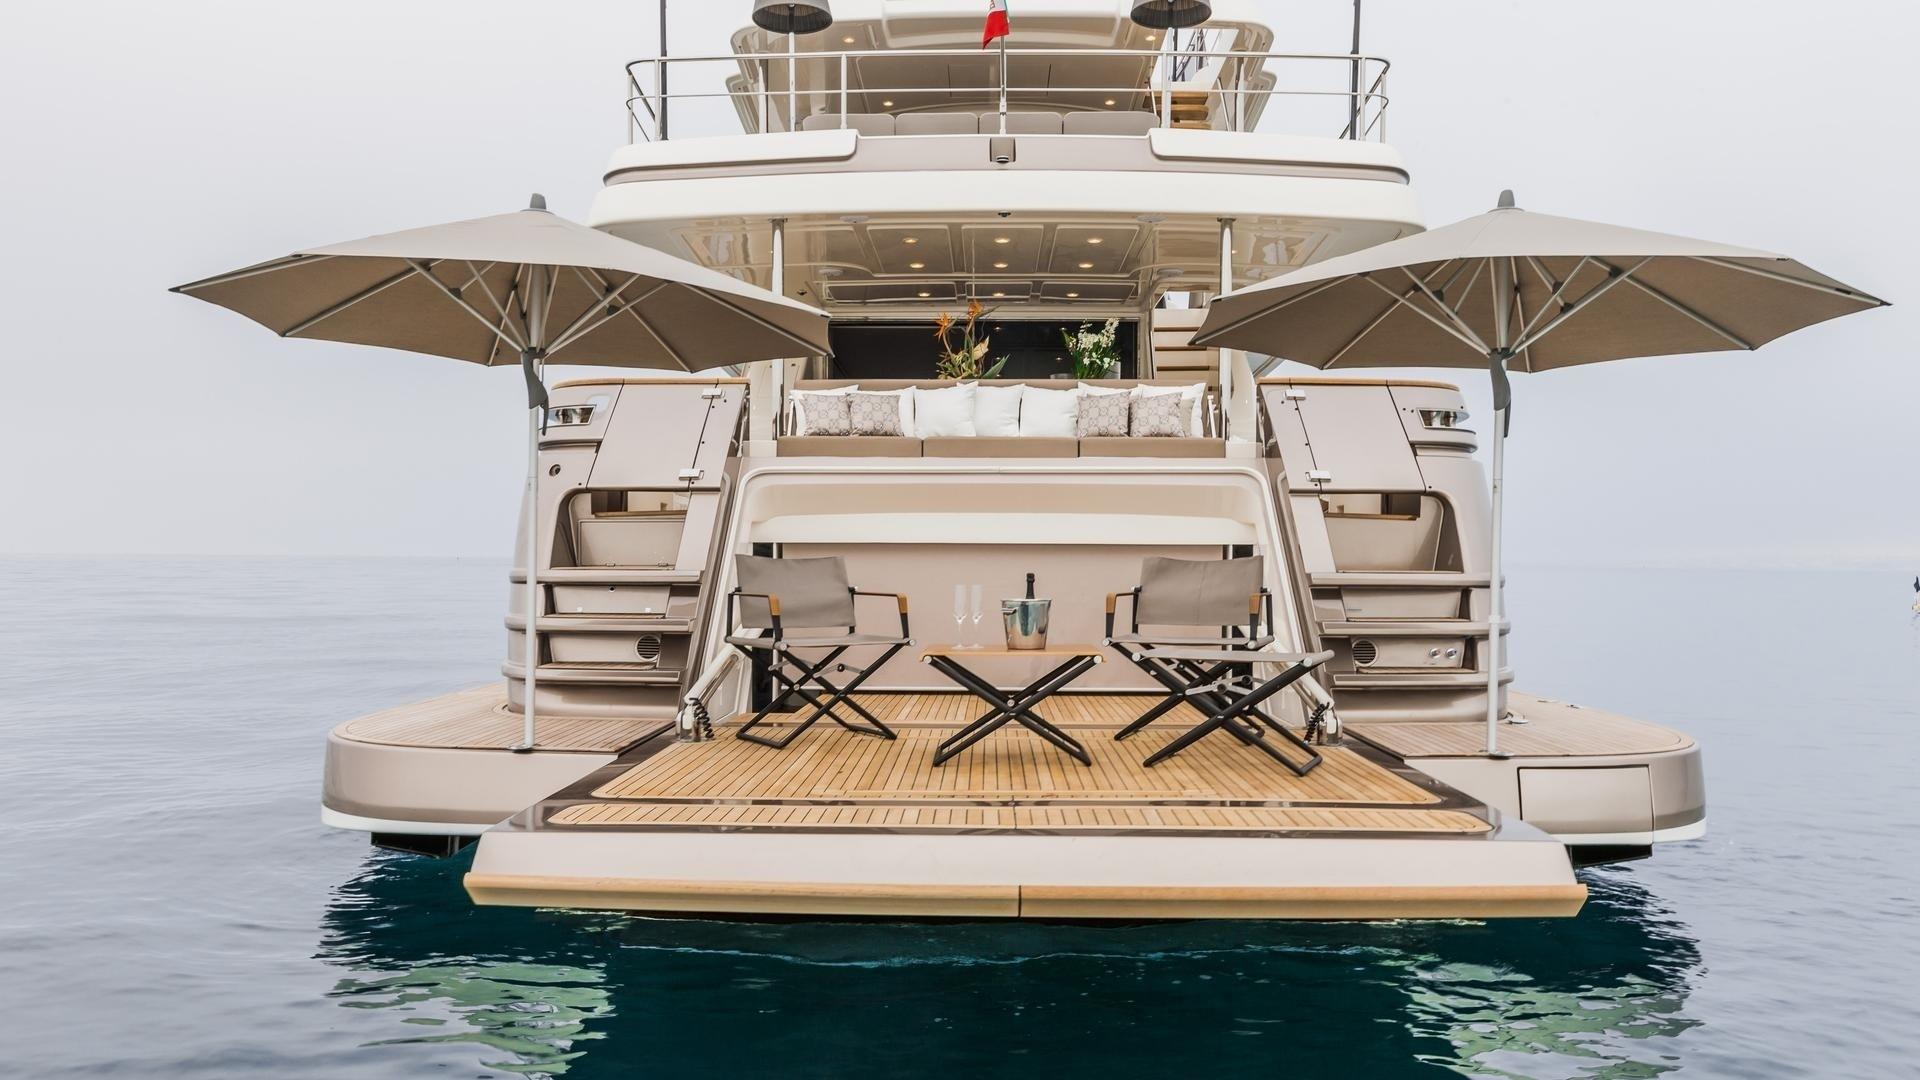 Alquiler de barcos, Alquiler de yates en Ibiza. Yates de alquiler en Ibiza.